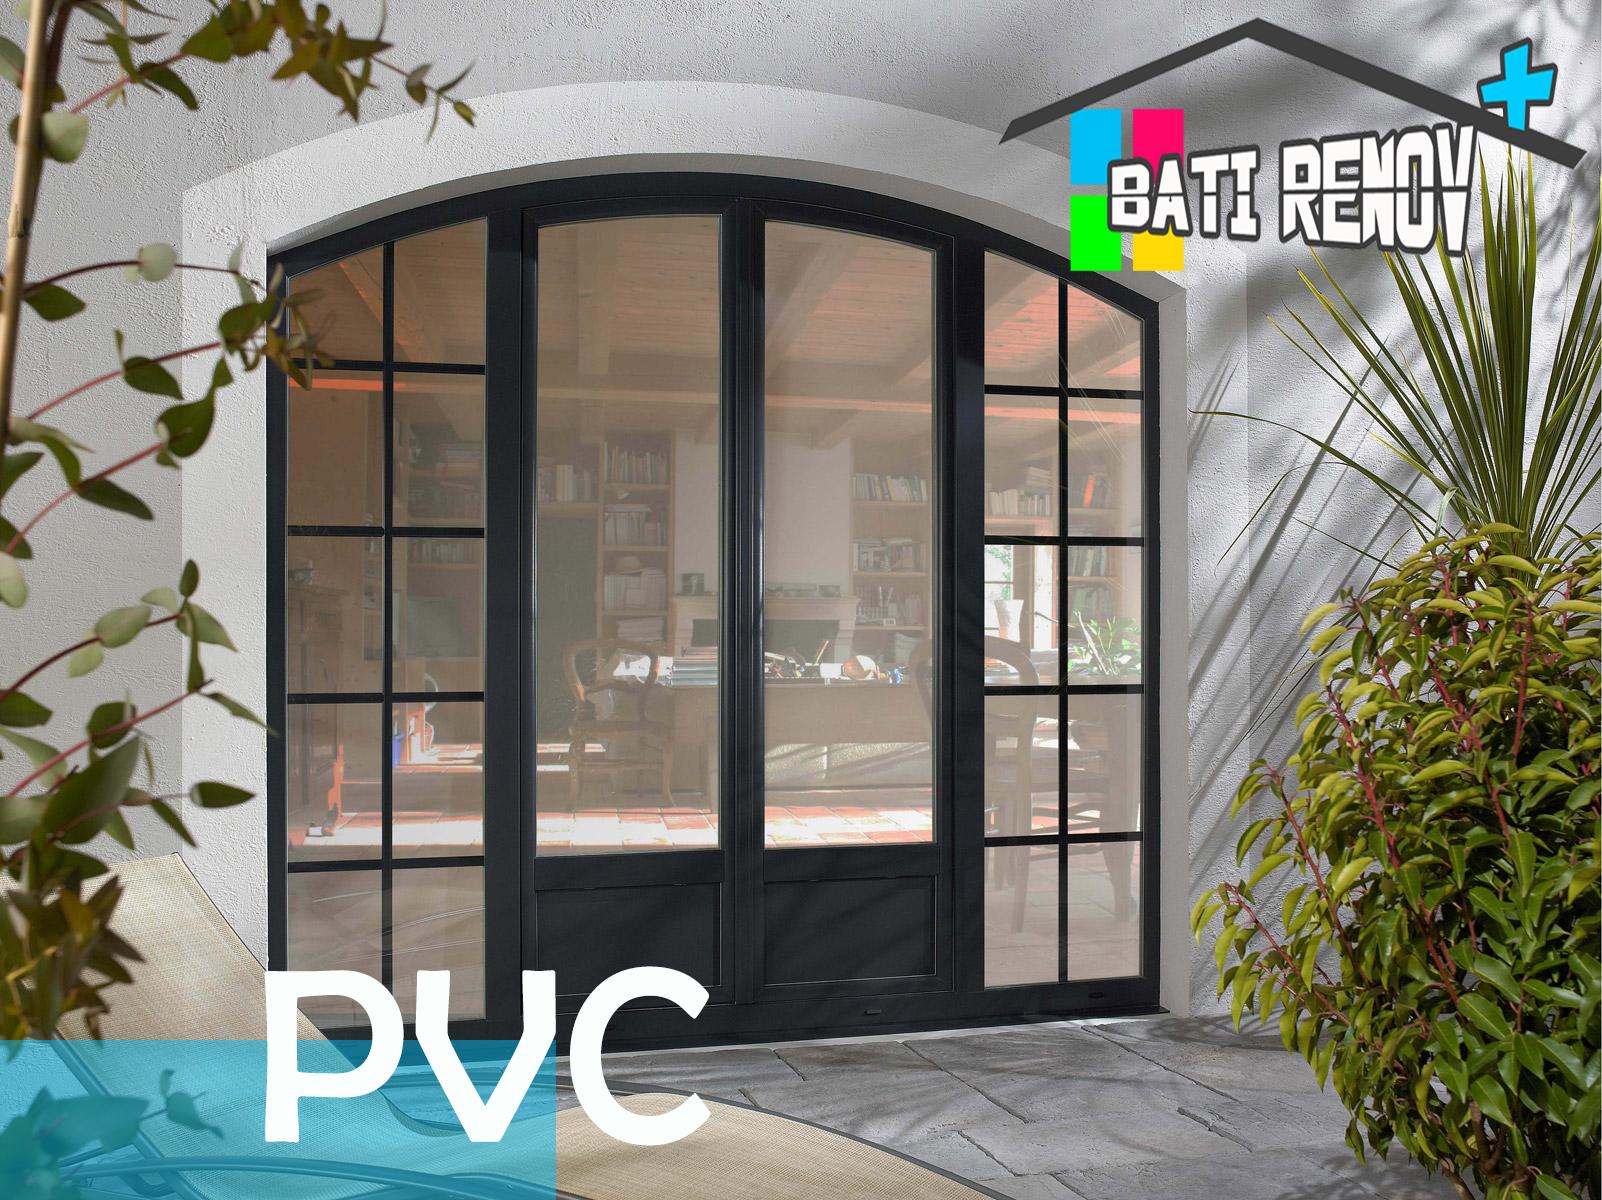 fenetre pvc haut de gamme 416 icone bati renov plus. Black Bedroom Furniture Sets. Home Design Ideas